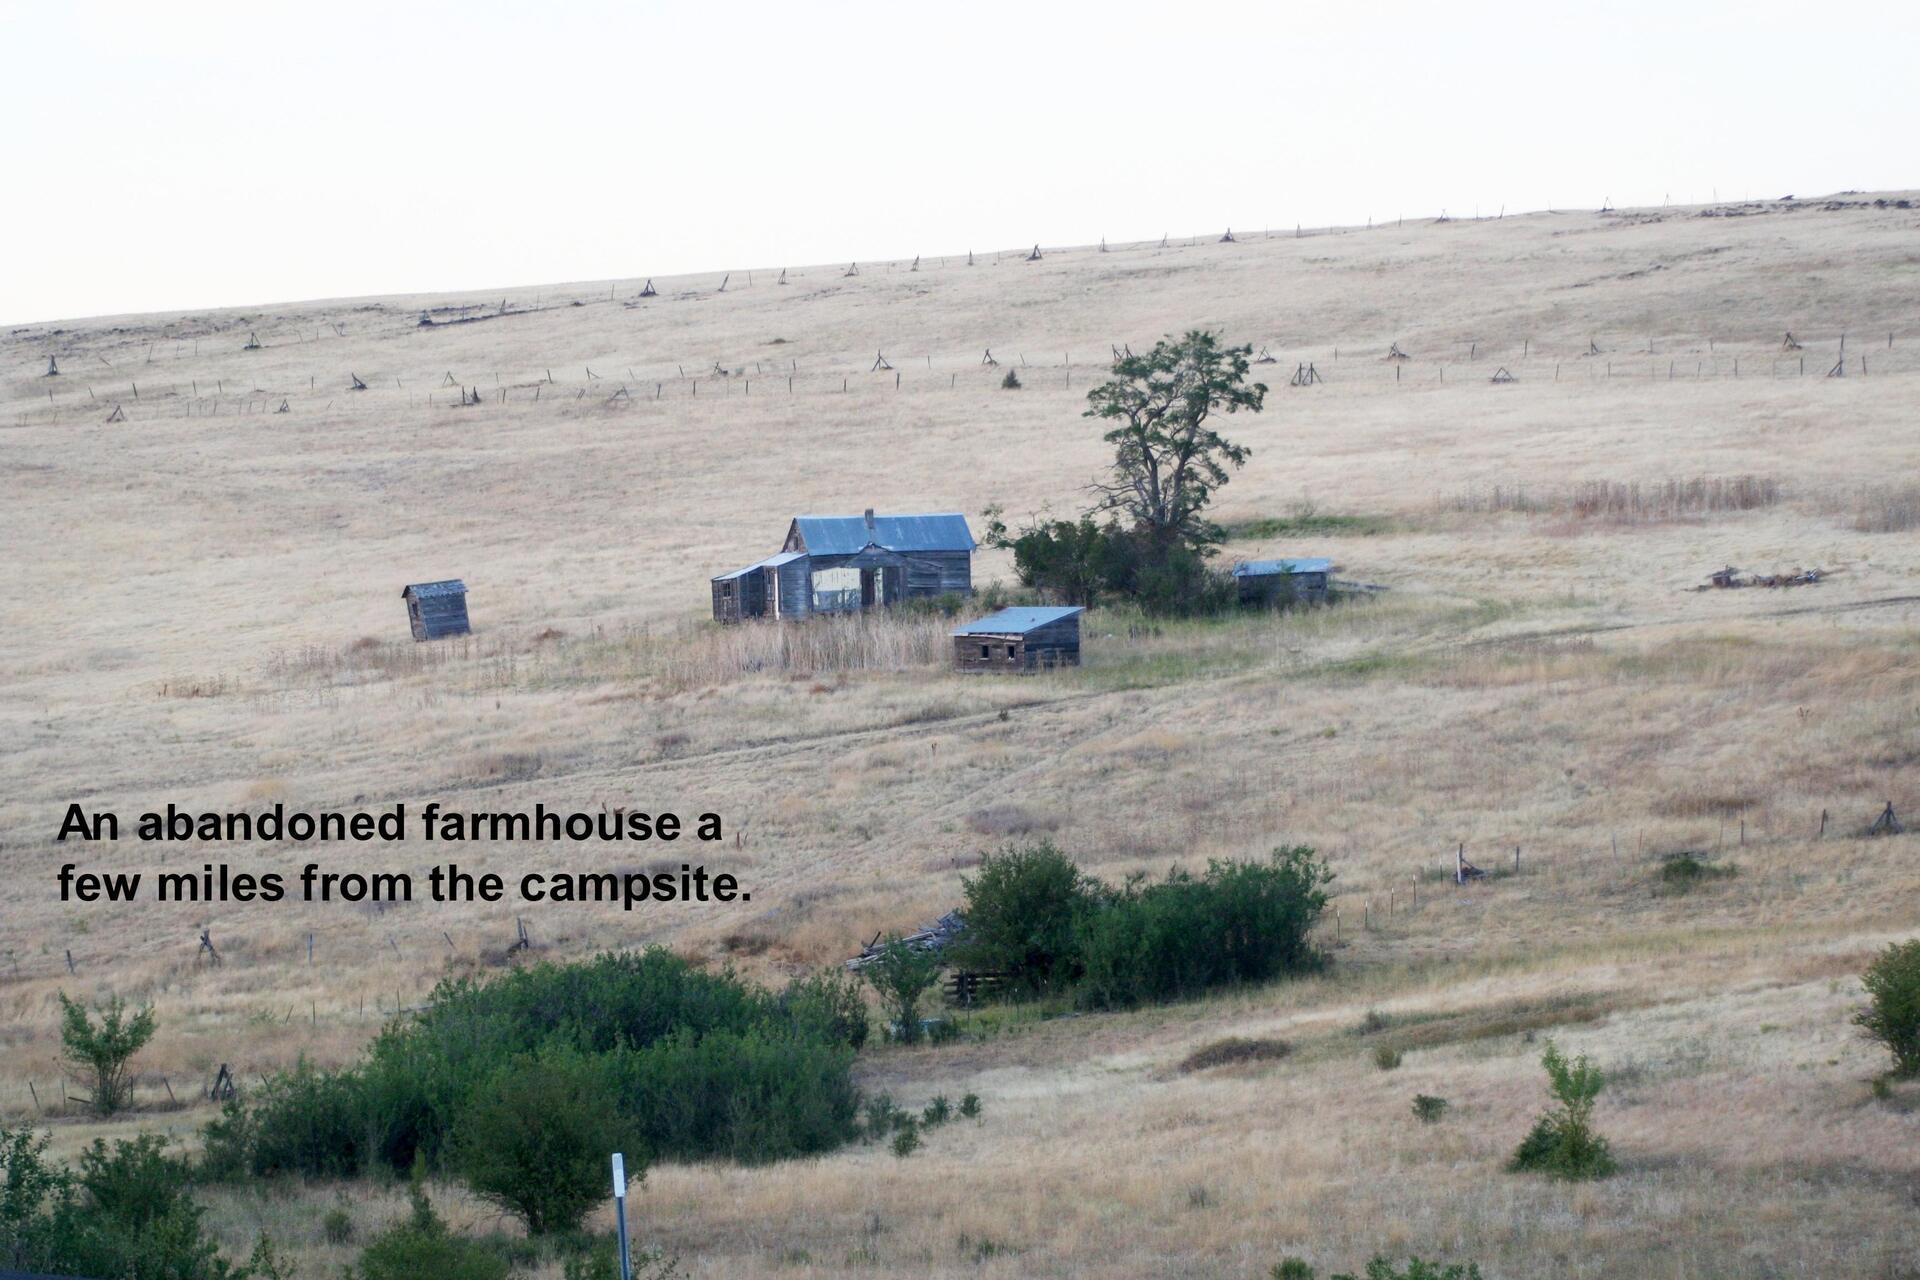 AbandonedFarmhouse2.jpg